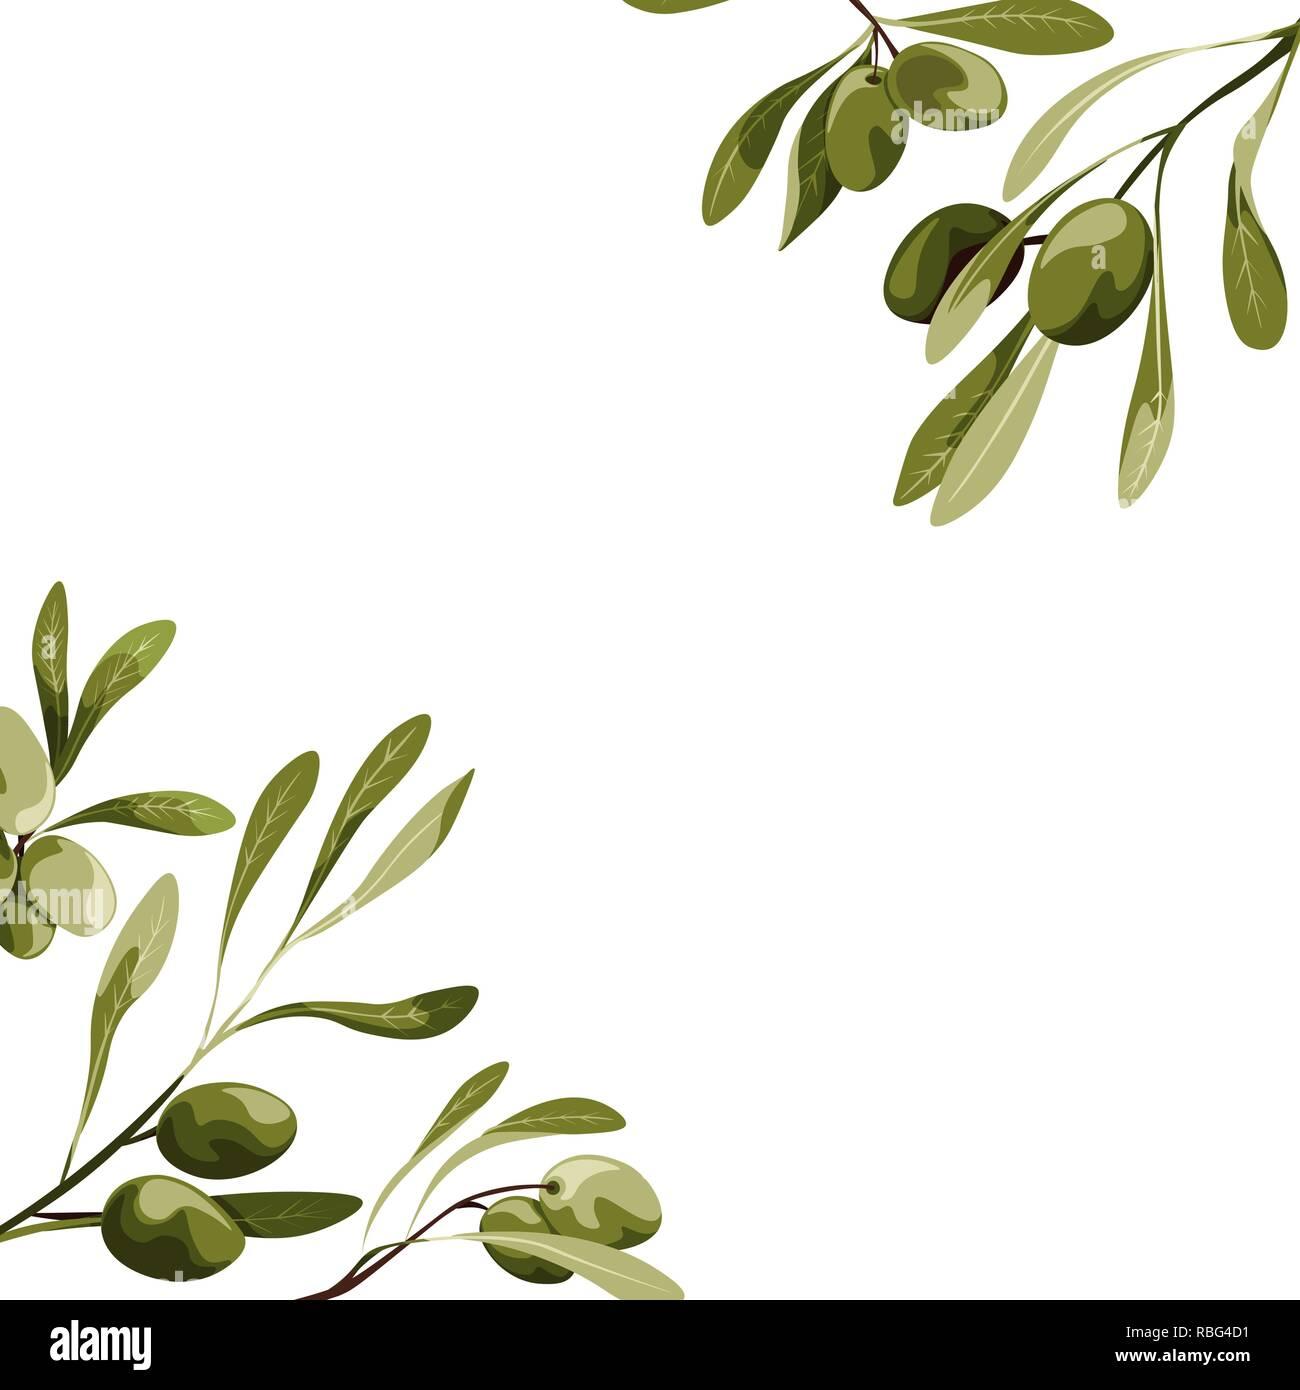 Vector corners with olive tree decoration. Vegan food illustration - Stock Image